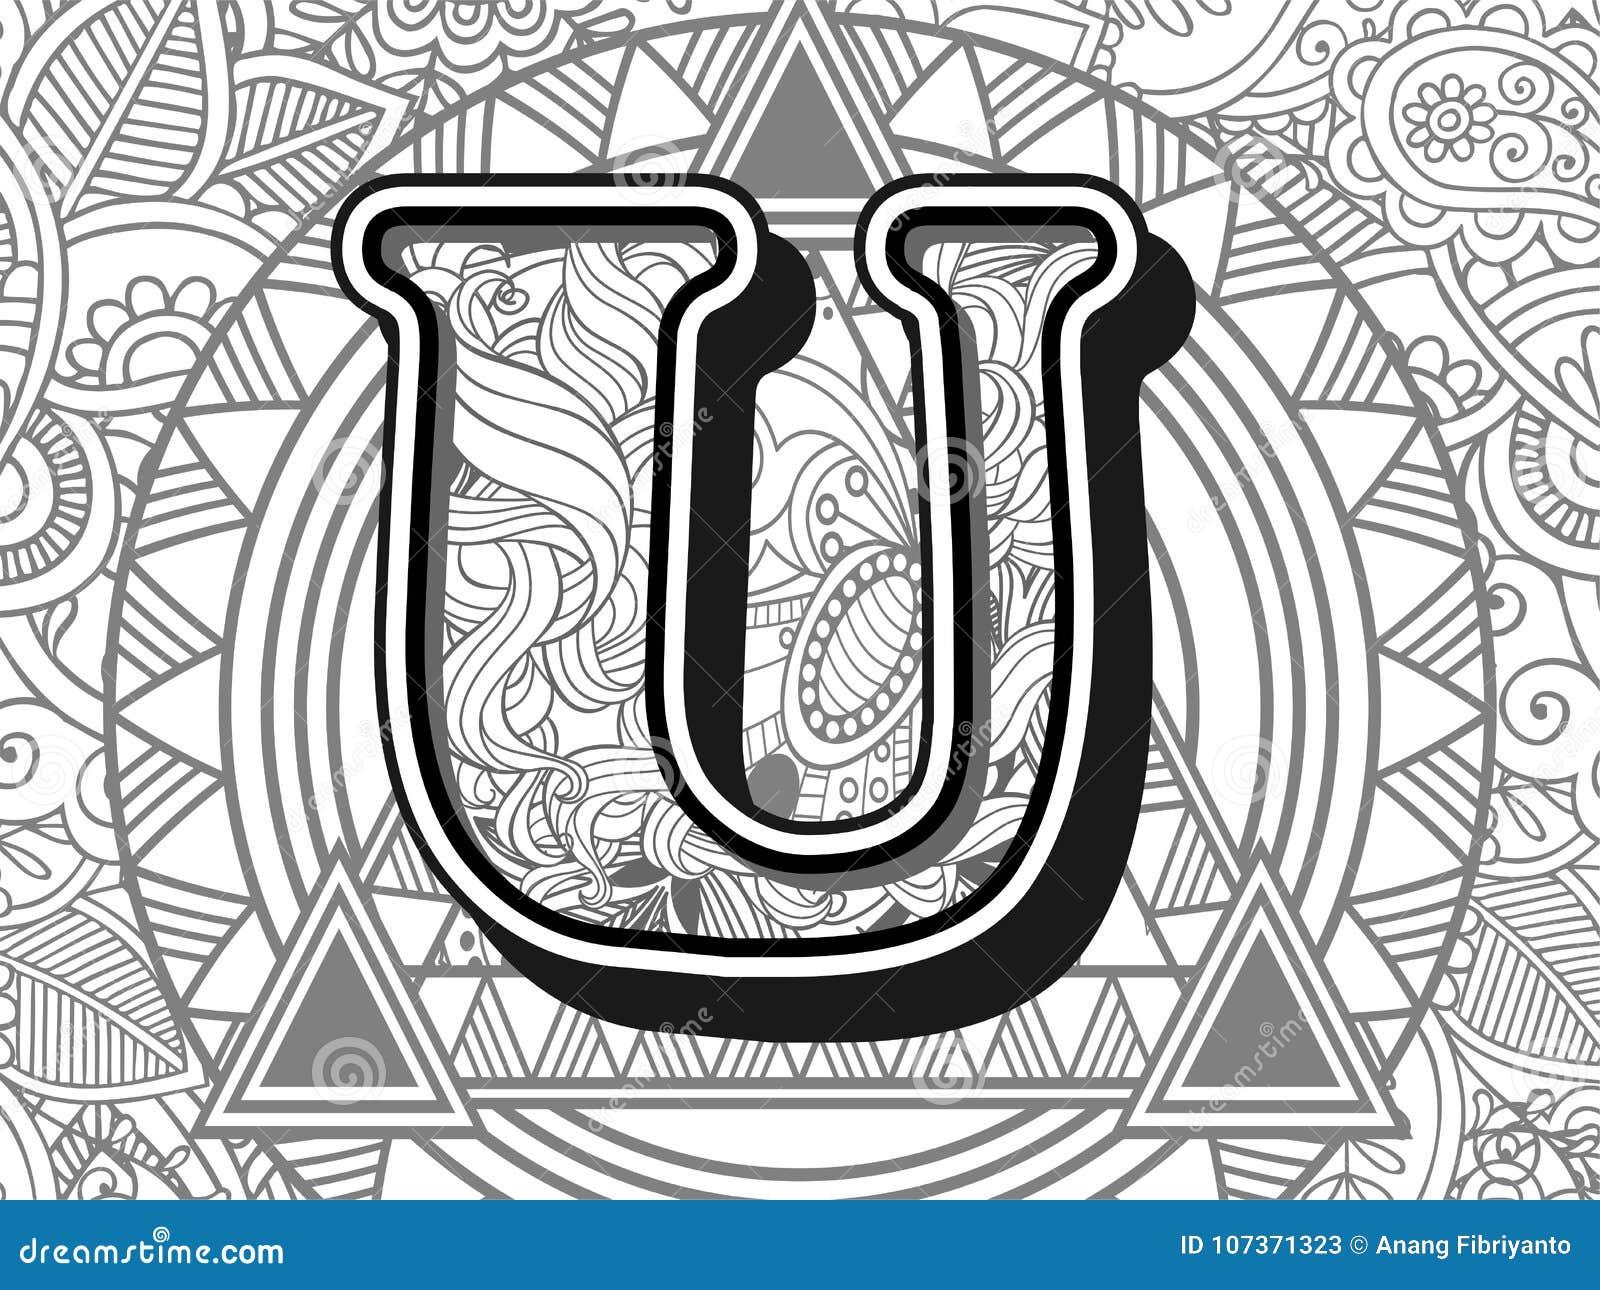 zentangle stylized alphabet letter u. black and white hand drawn